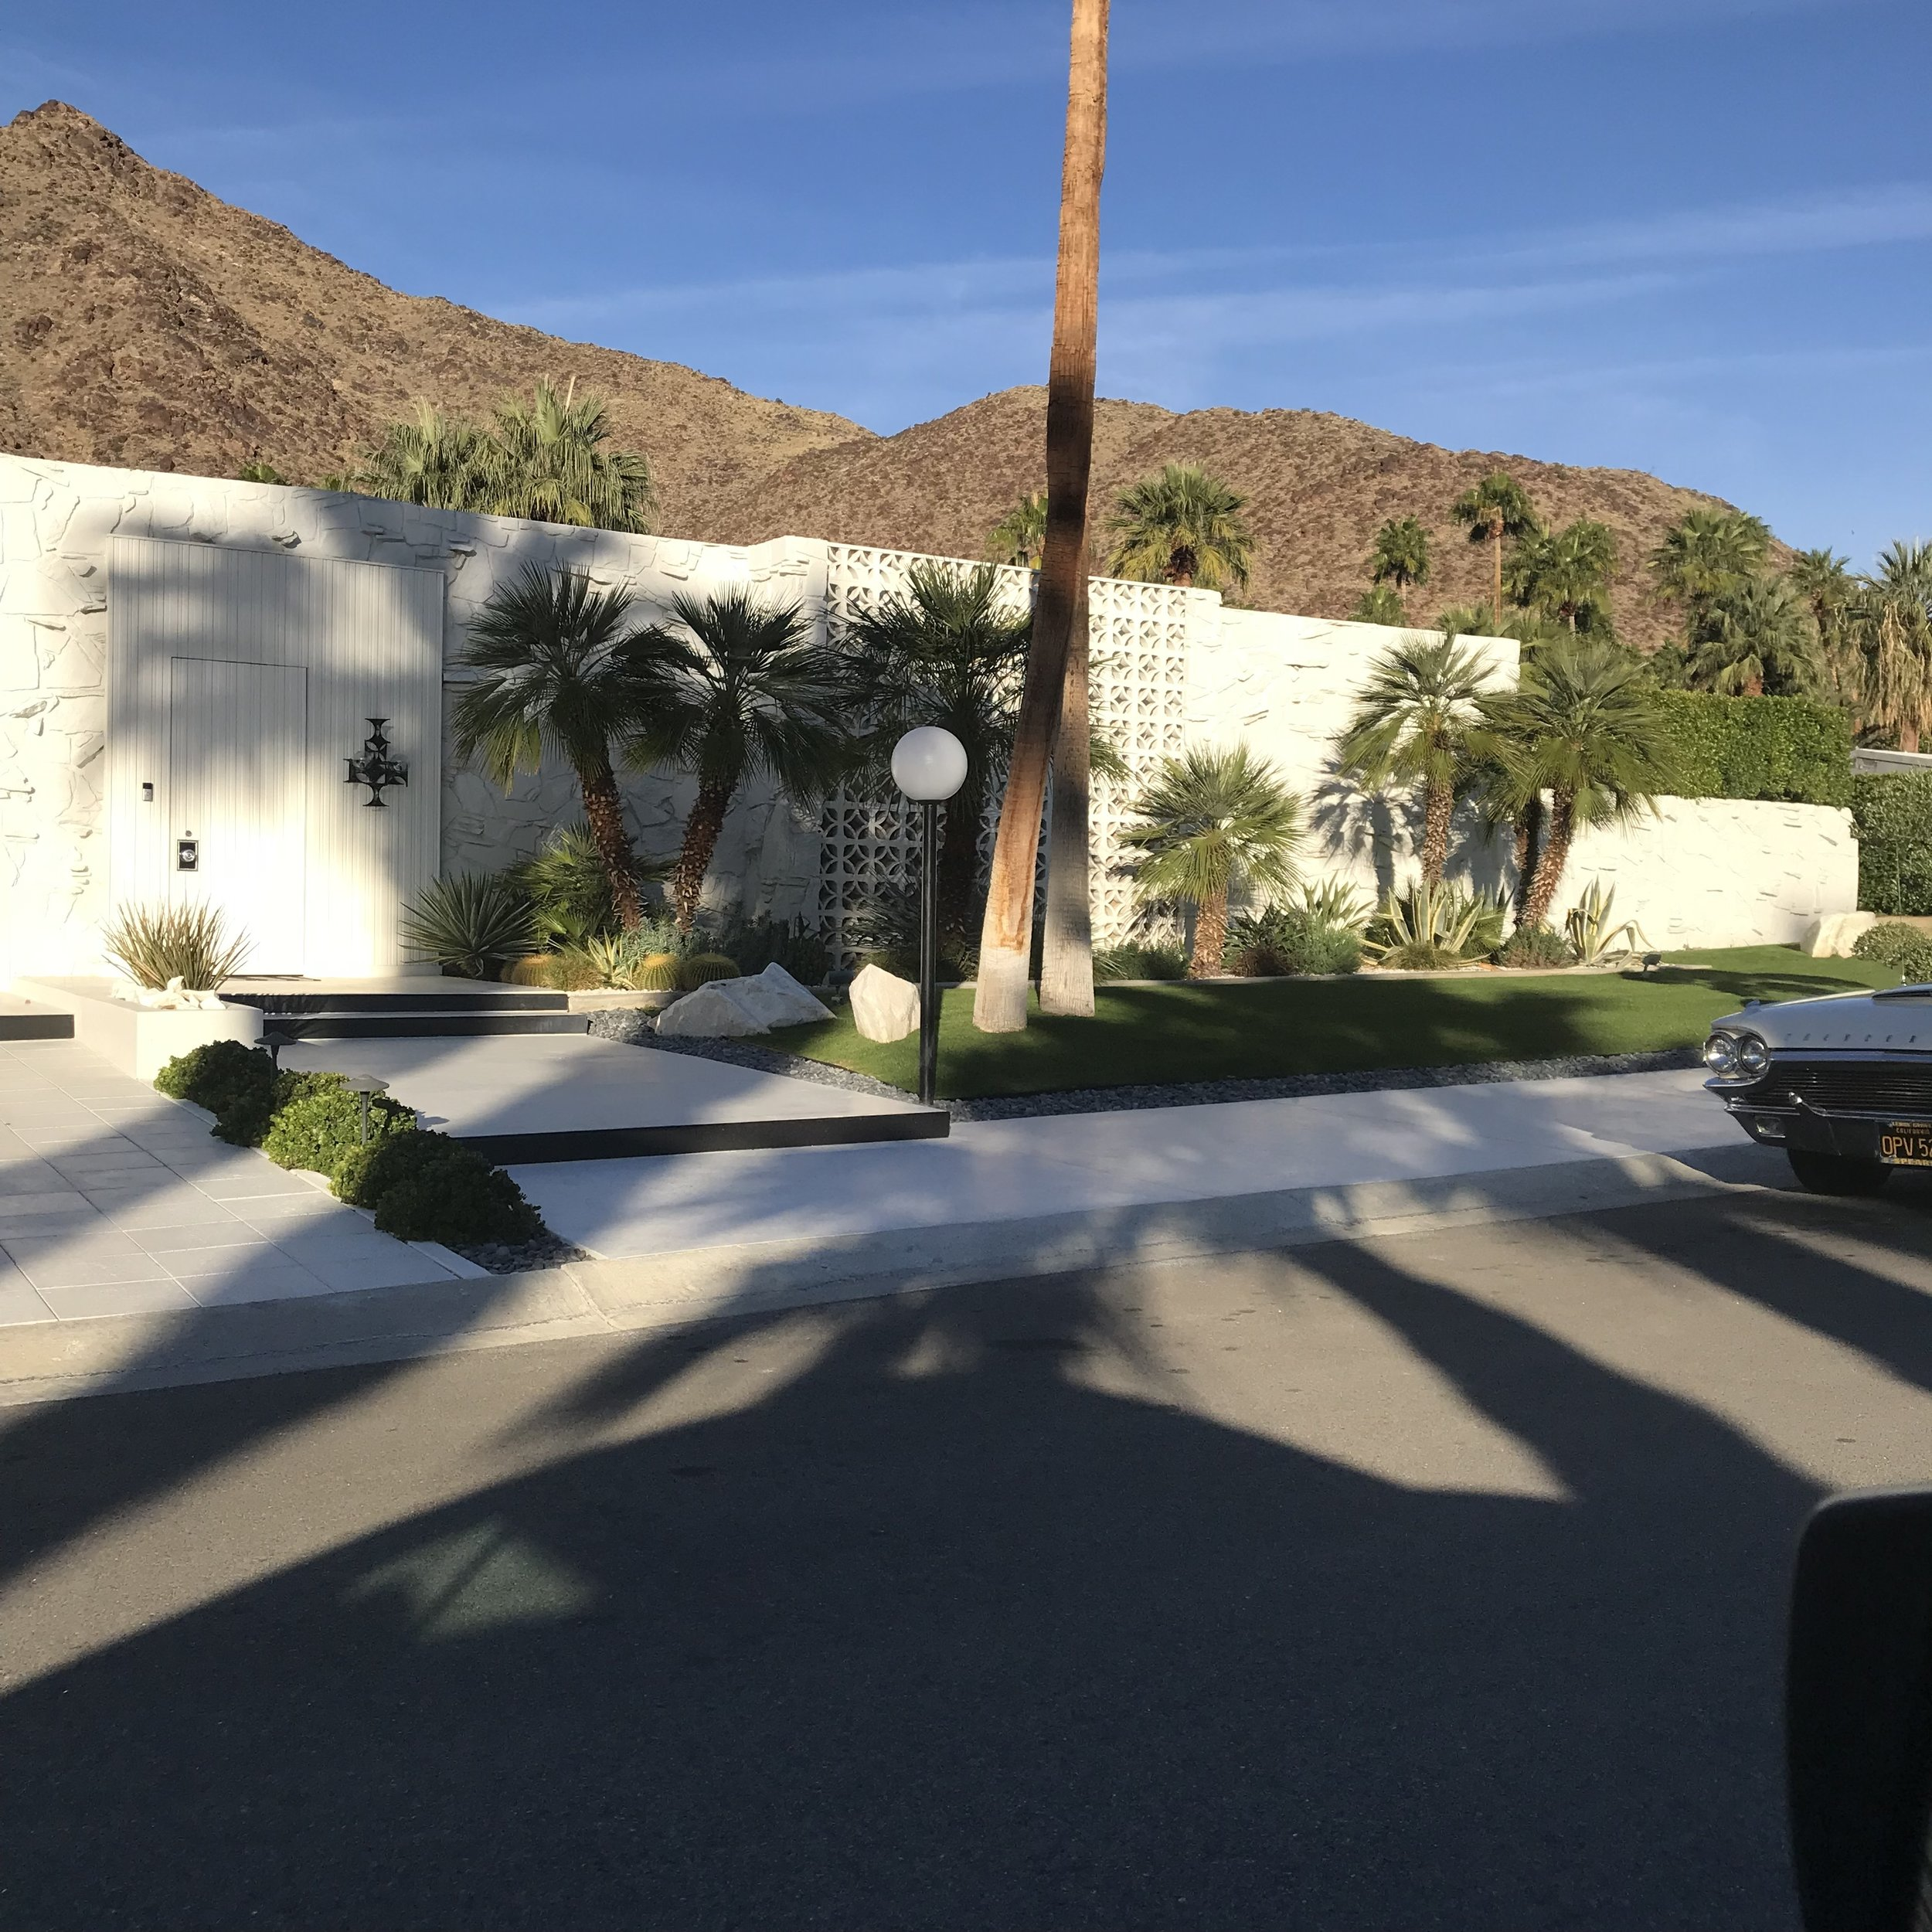 palm springs architectural tour. white bungalow. Blue Moon Furniture store winnipeg manitoba .JPG